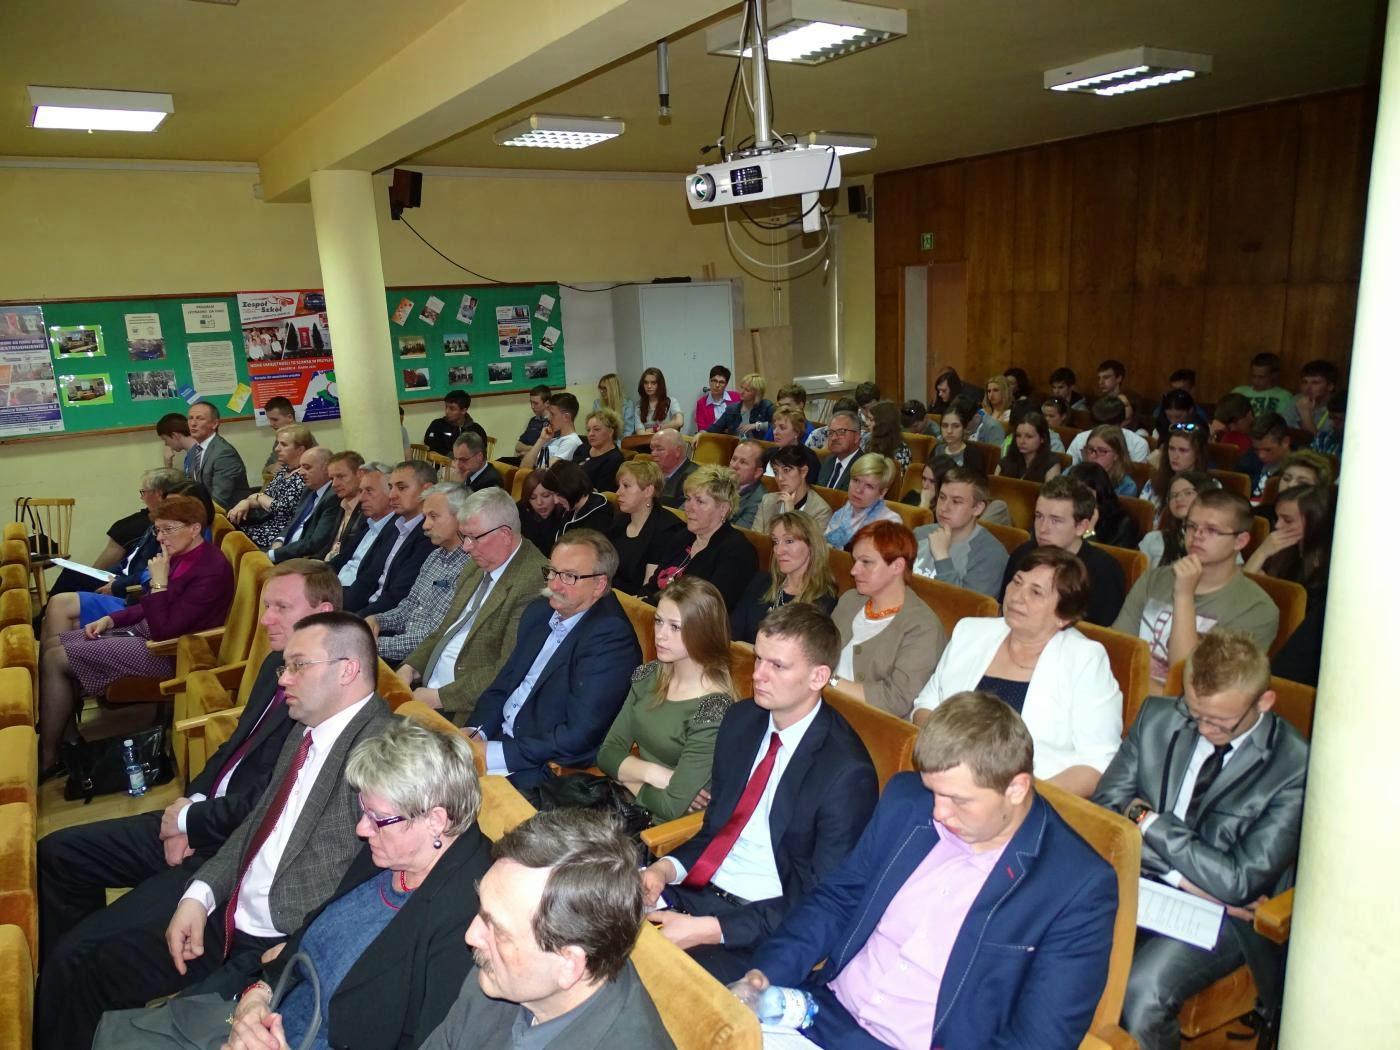 http://bemzawiercie.pl/wp-content/uploads/2017/04/konferencja-4.jpg